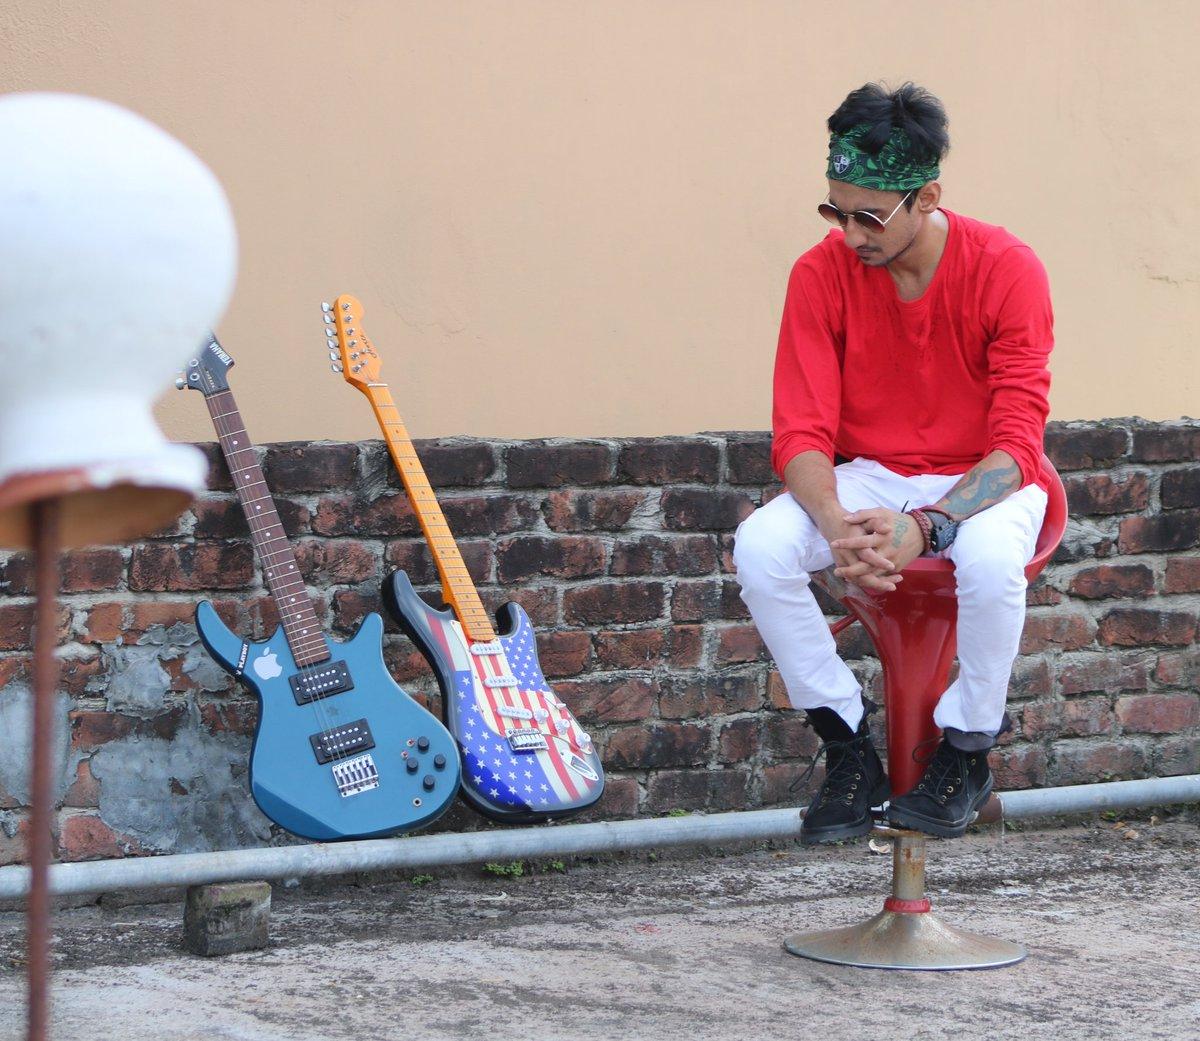 #crissjenner #emoboy #canonphotography #fashiondesigner #hollywood #nikon #canon #bollywoodfashion #bollywood #bollywoodcelebrity #actor #musician #photographer #newyork #actress #photography #photoshoot #bollywoodactress #bollywoodlife #udaipurtripura #mumbai #agartalapic.twitter.com/y6TaLQHHf8